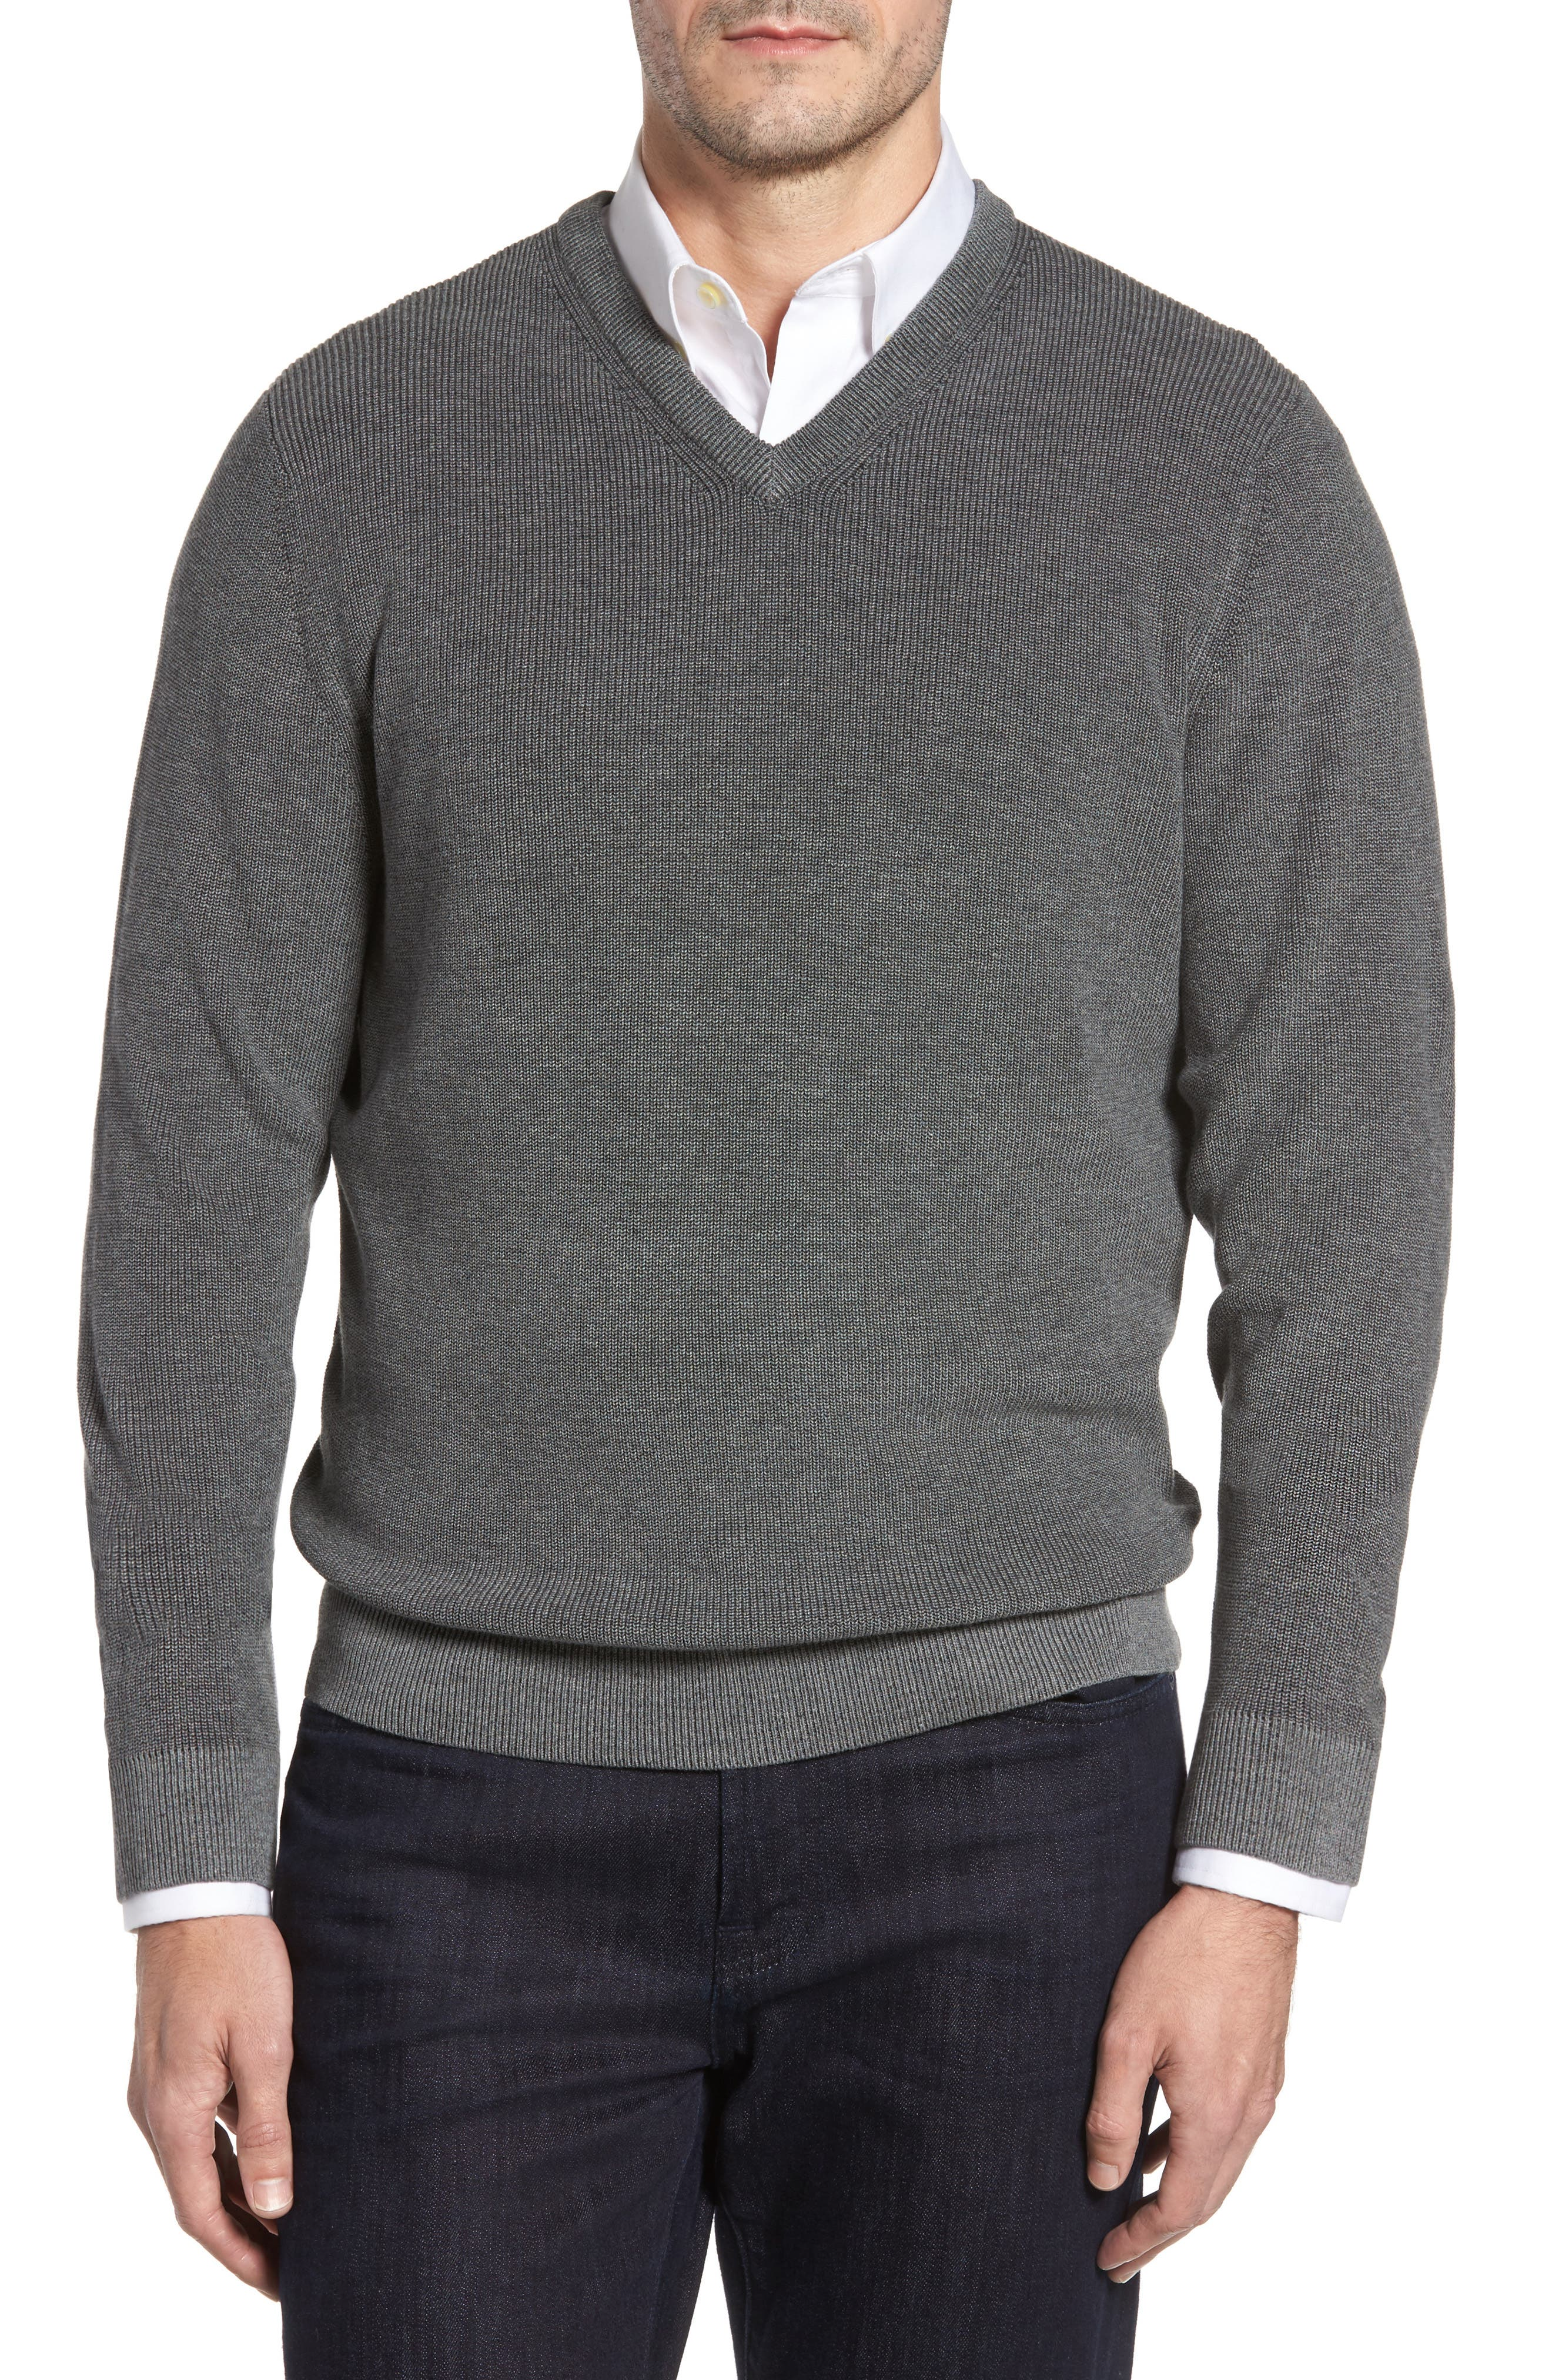 Las Palmas Reversible Sweater,                             Main thumbnail 1, color,                             Charcoal Heather